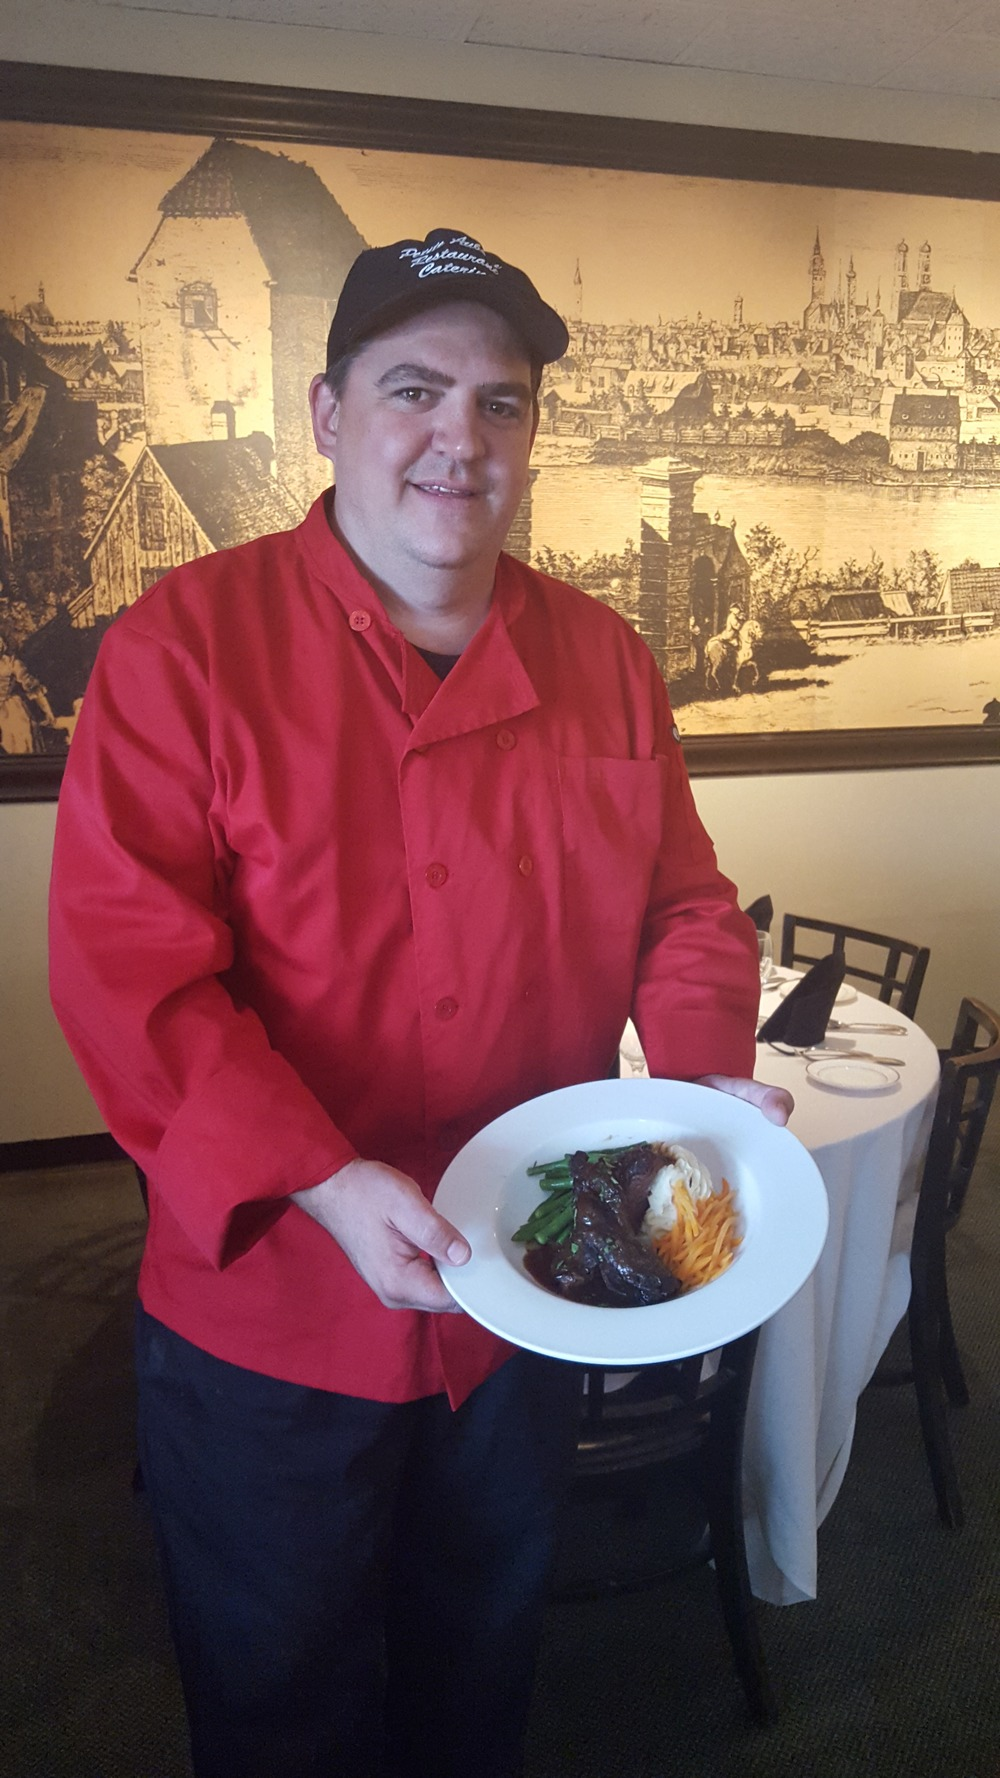 a42acbaa5640 Meet Our Chef — Atlanta French Restaurant Petite Violette